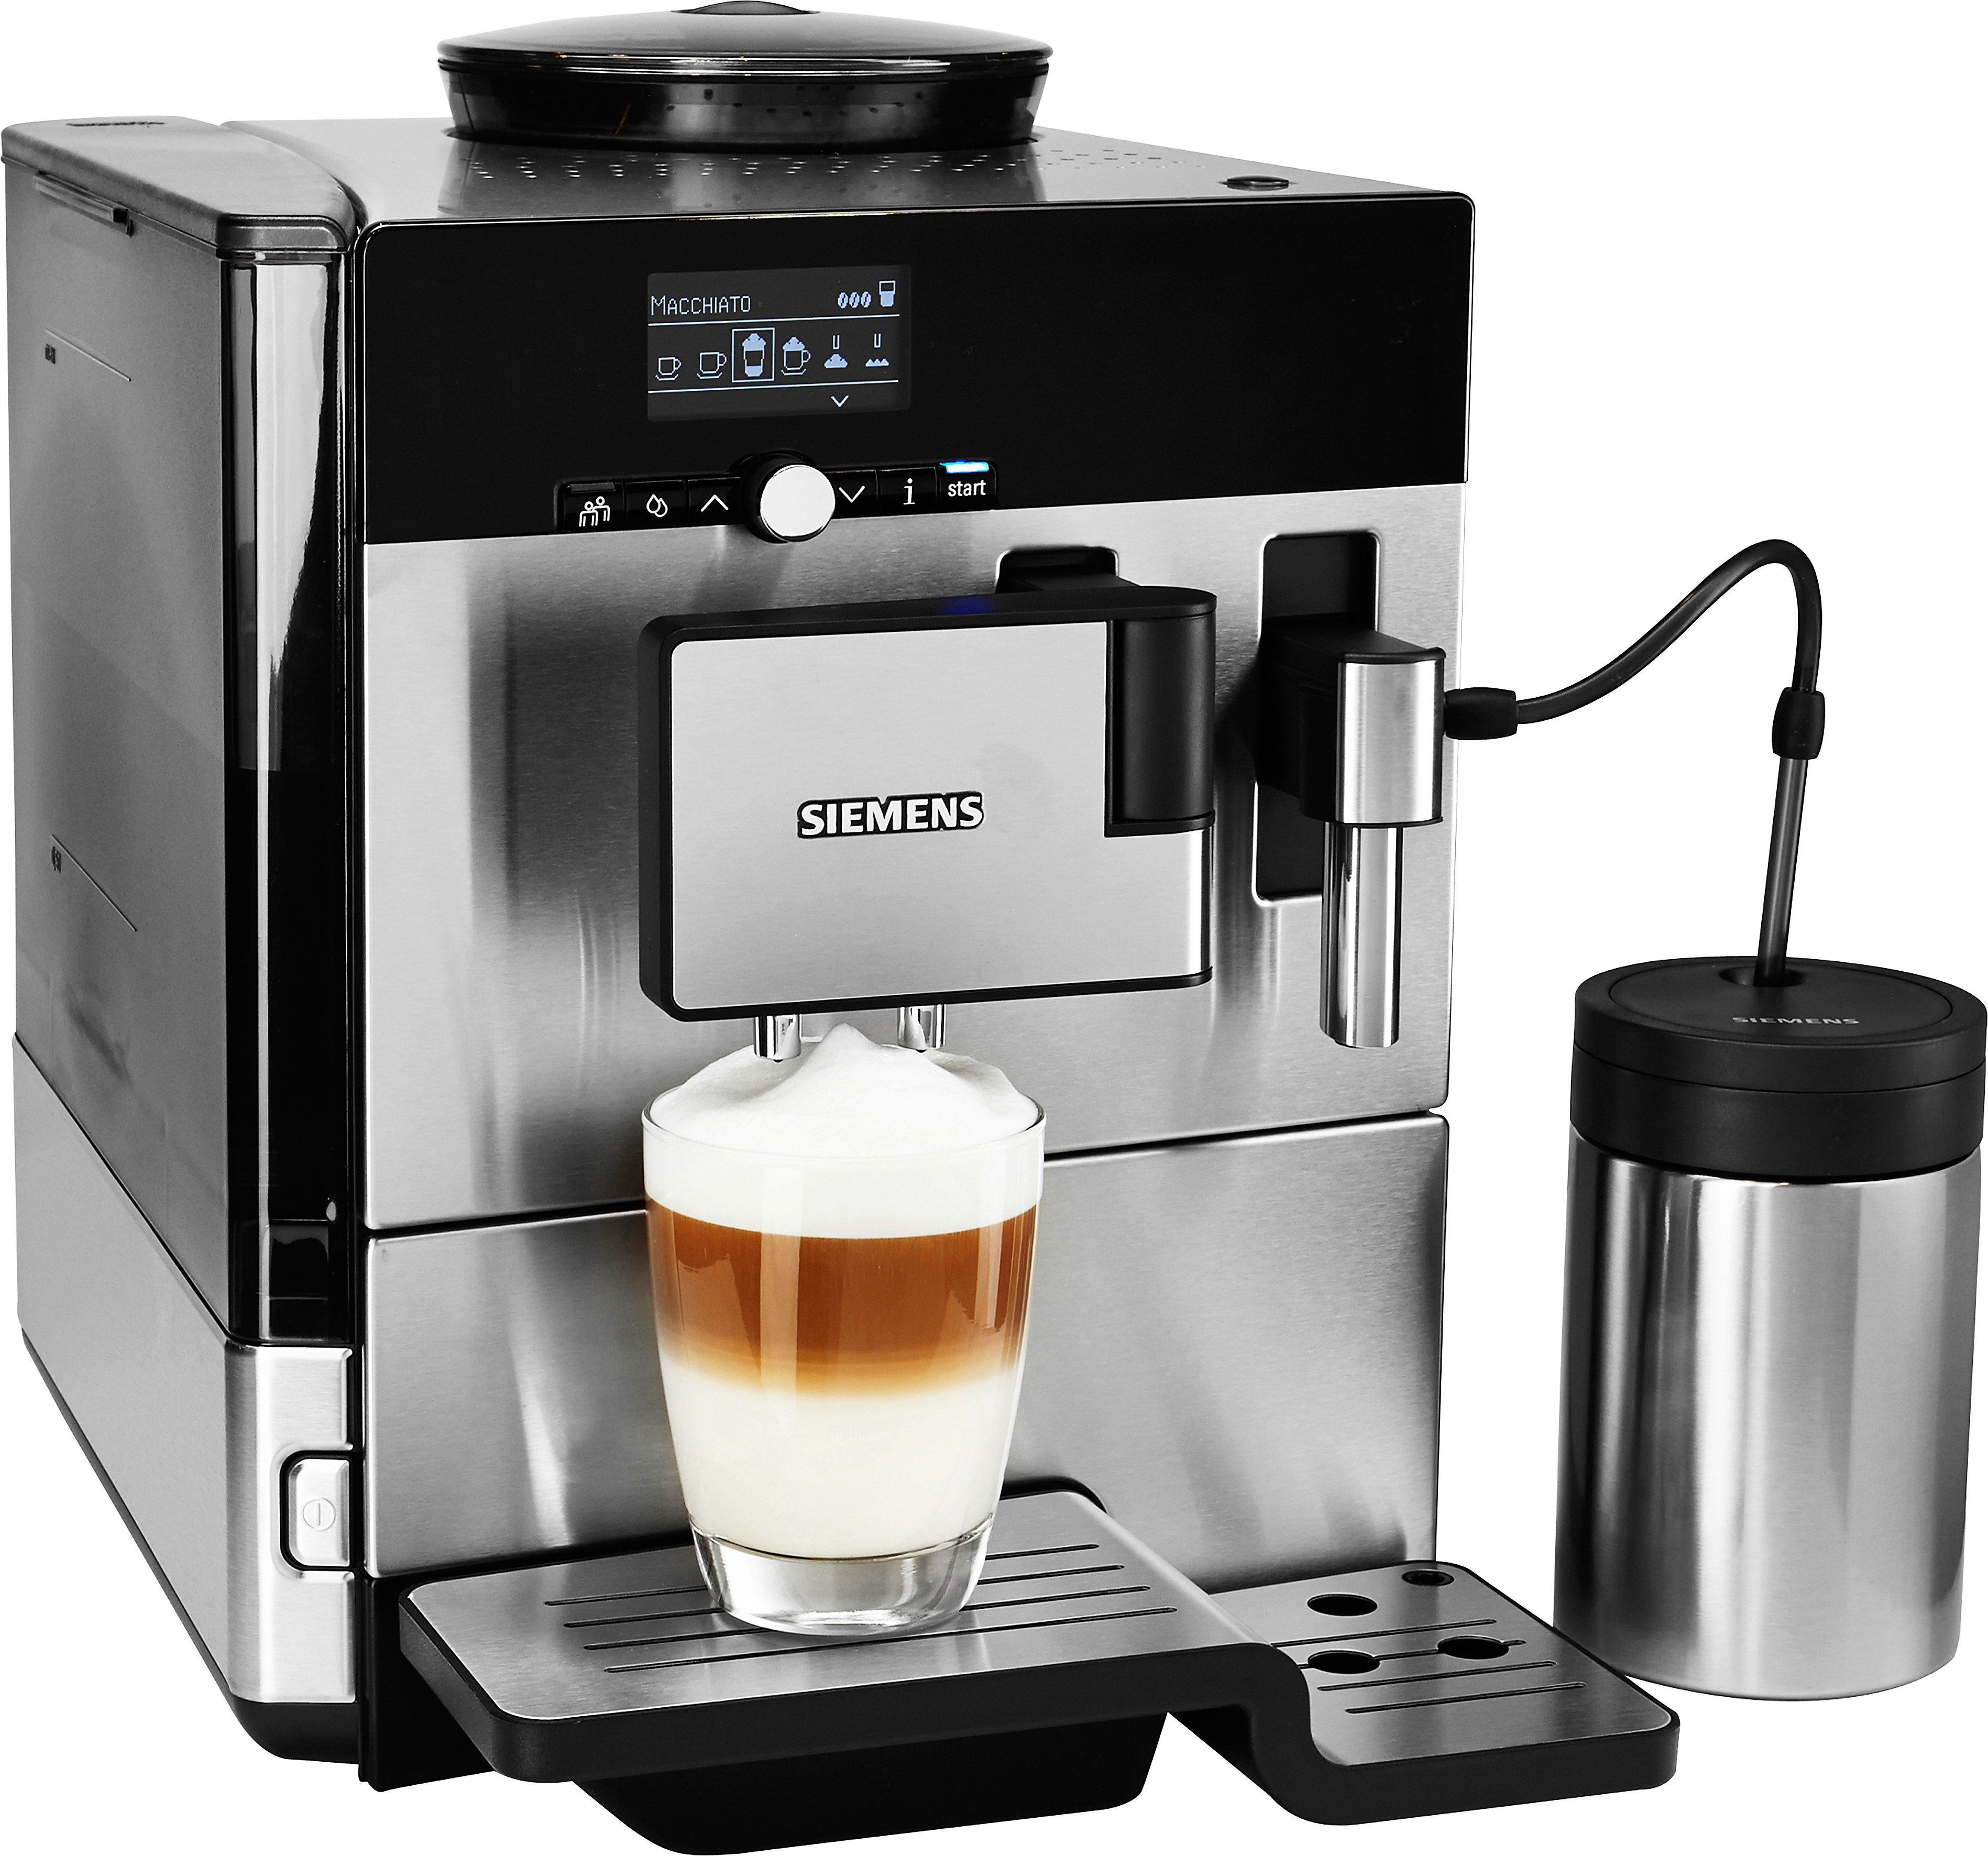 SIEMENS Kaffeevollautomat EQ.8 series 600 TE806501DE, 2,4l Tank, Scheibenmahlwerk, inkl. Isoliermilchbehälter